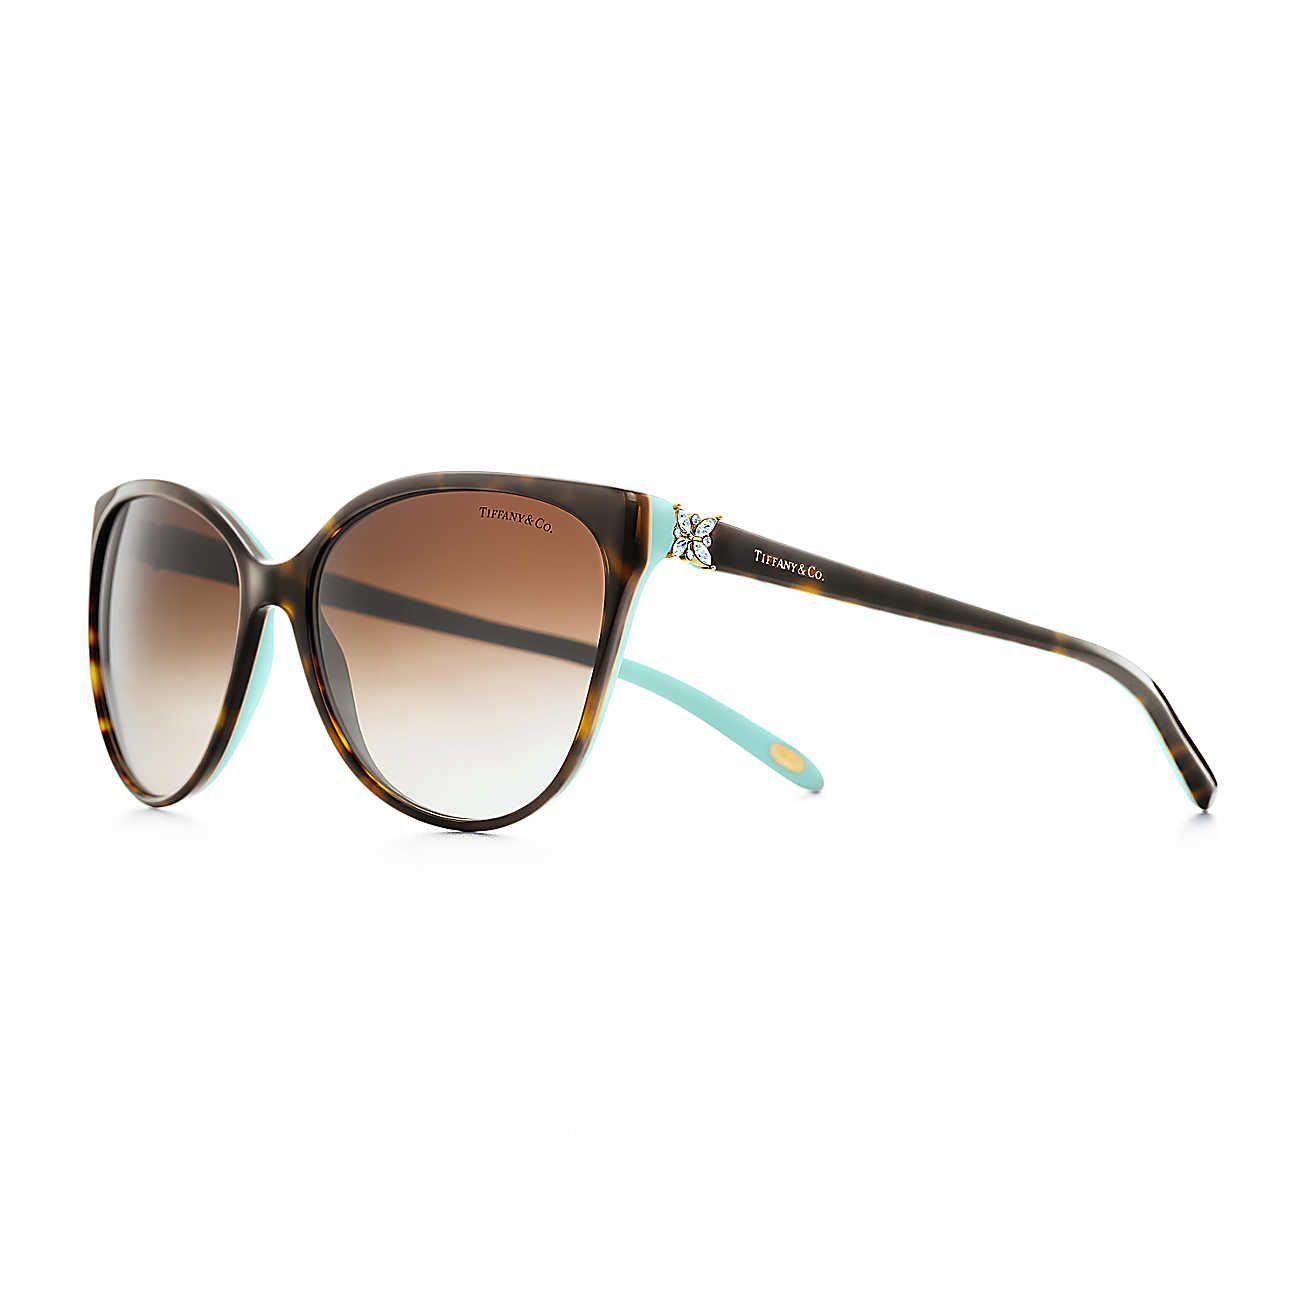 Pin De Natalia Silva Em Oculos Acessorios Oculos De Sol Estilo